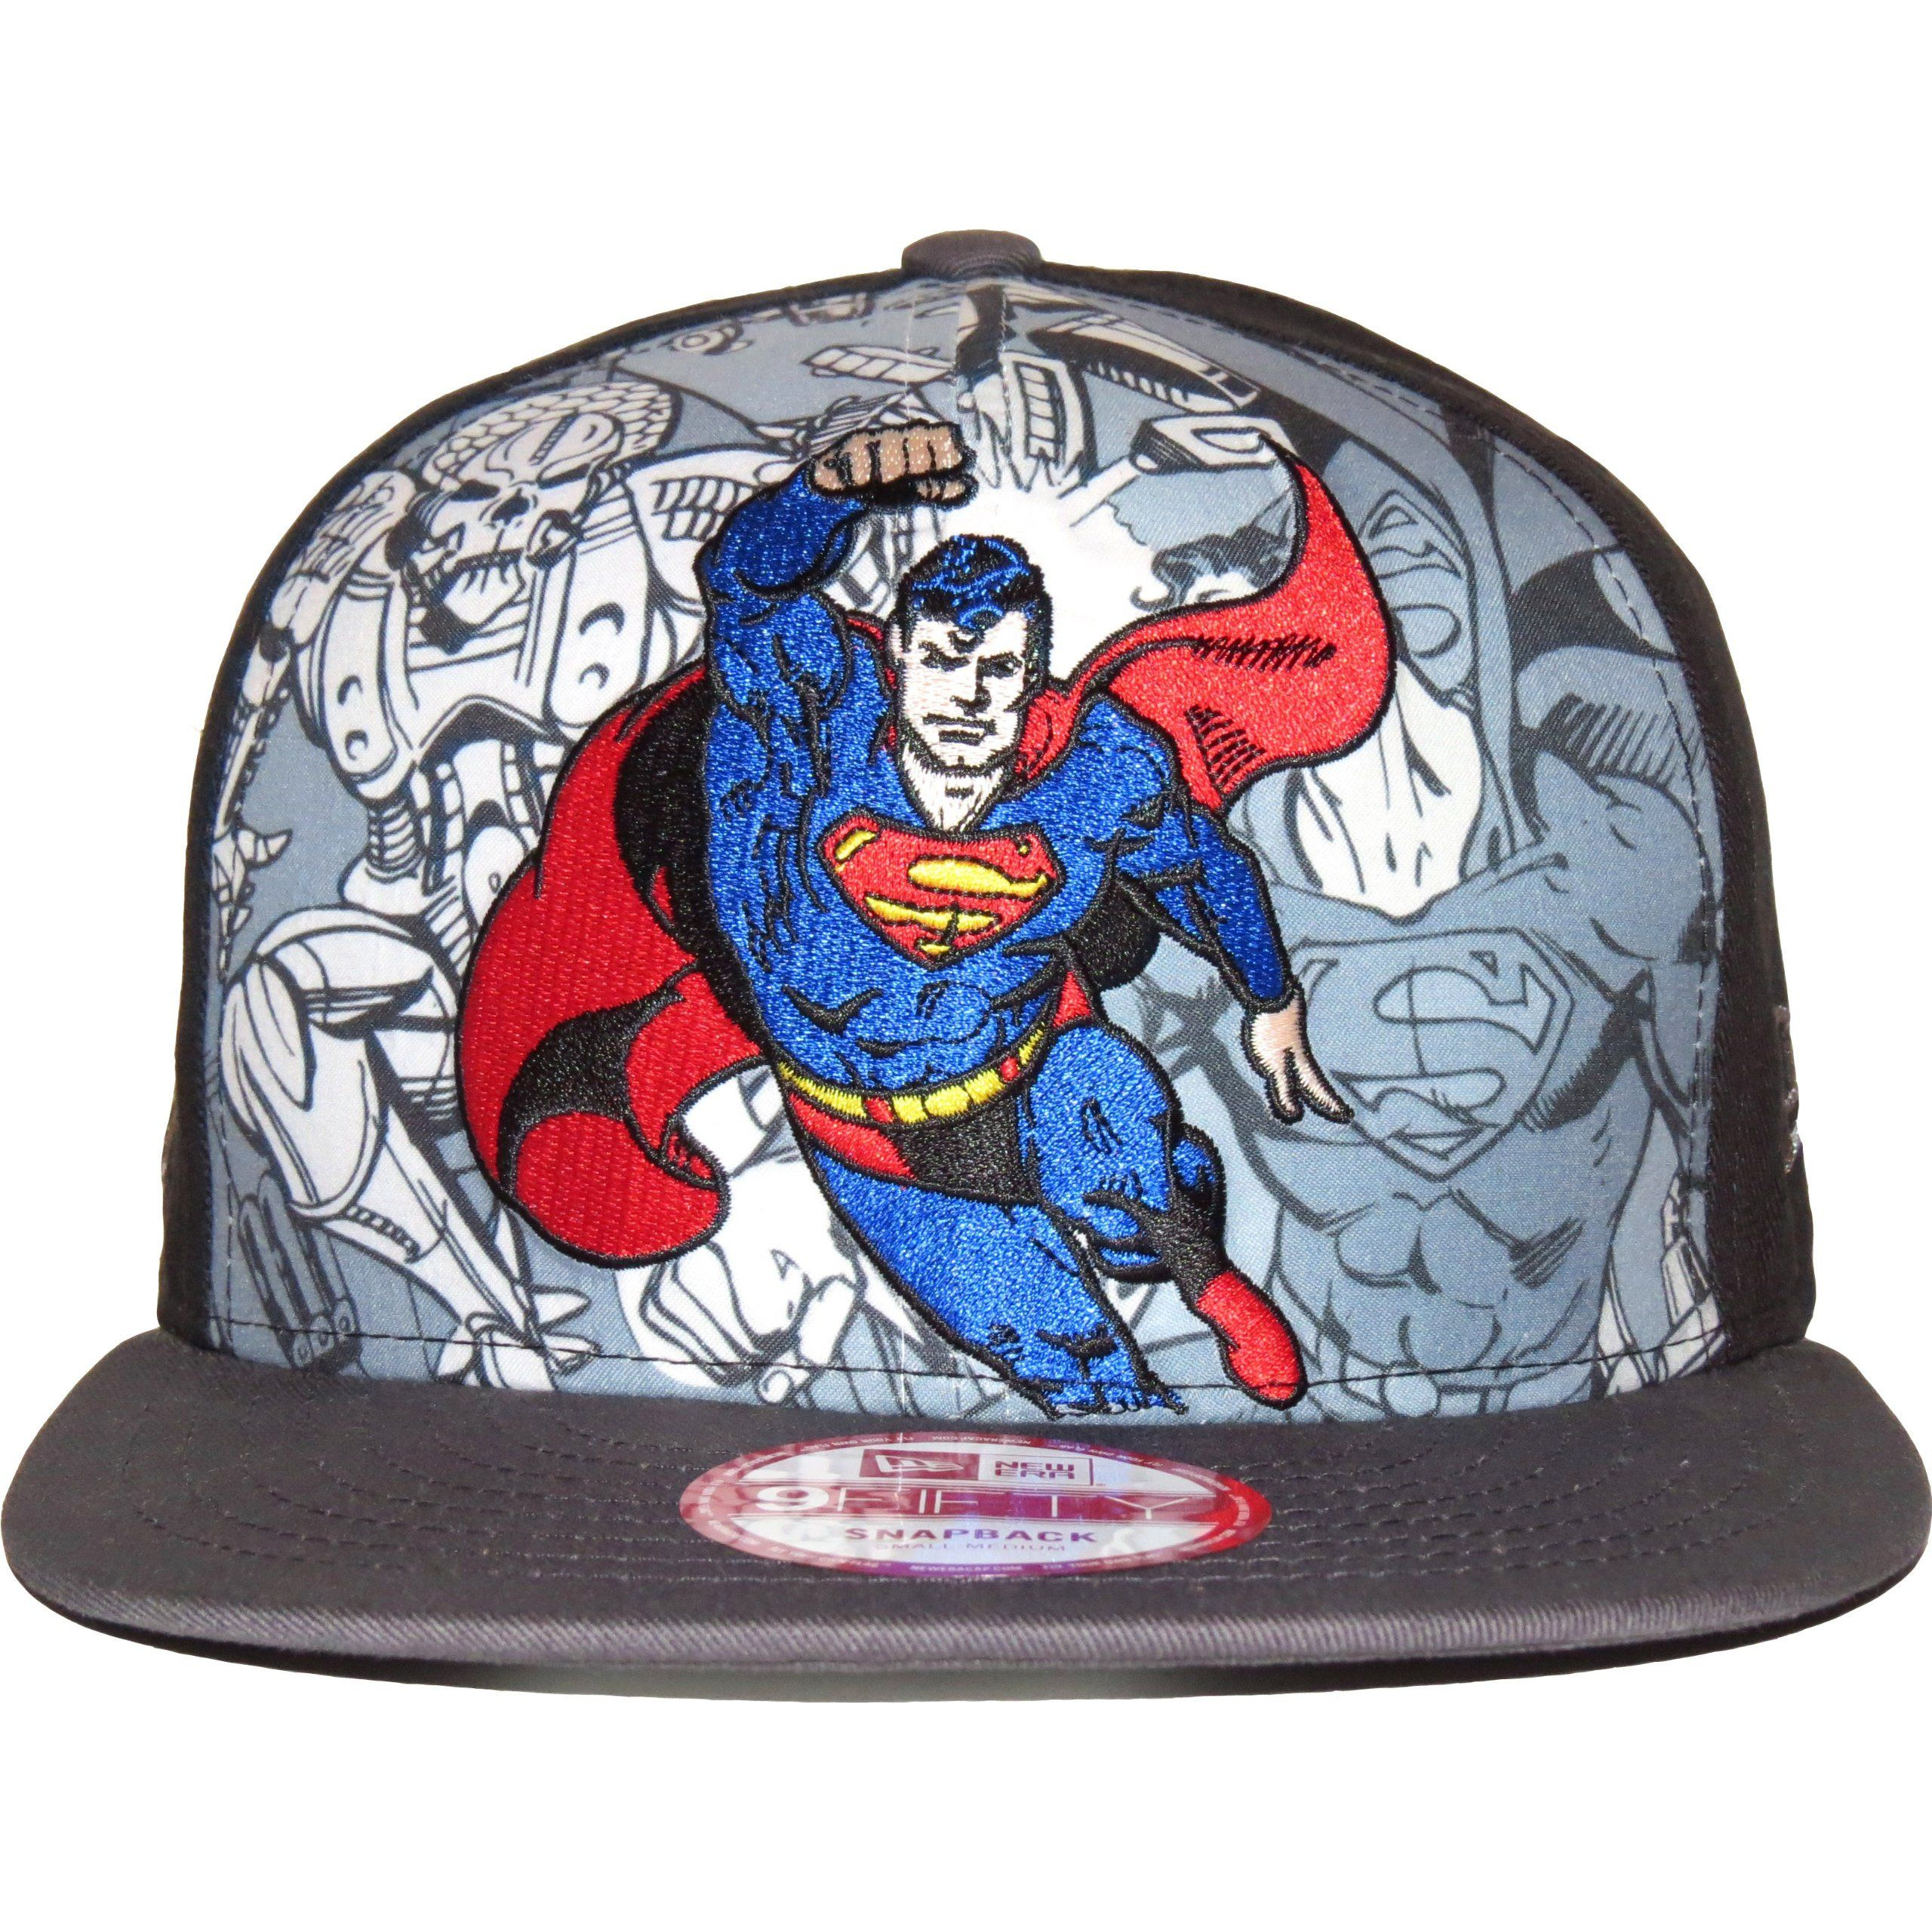 cd07a3a3042cf New Era 9Fifty Hero Break Out Superman Snapback Cap   New Era